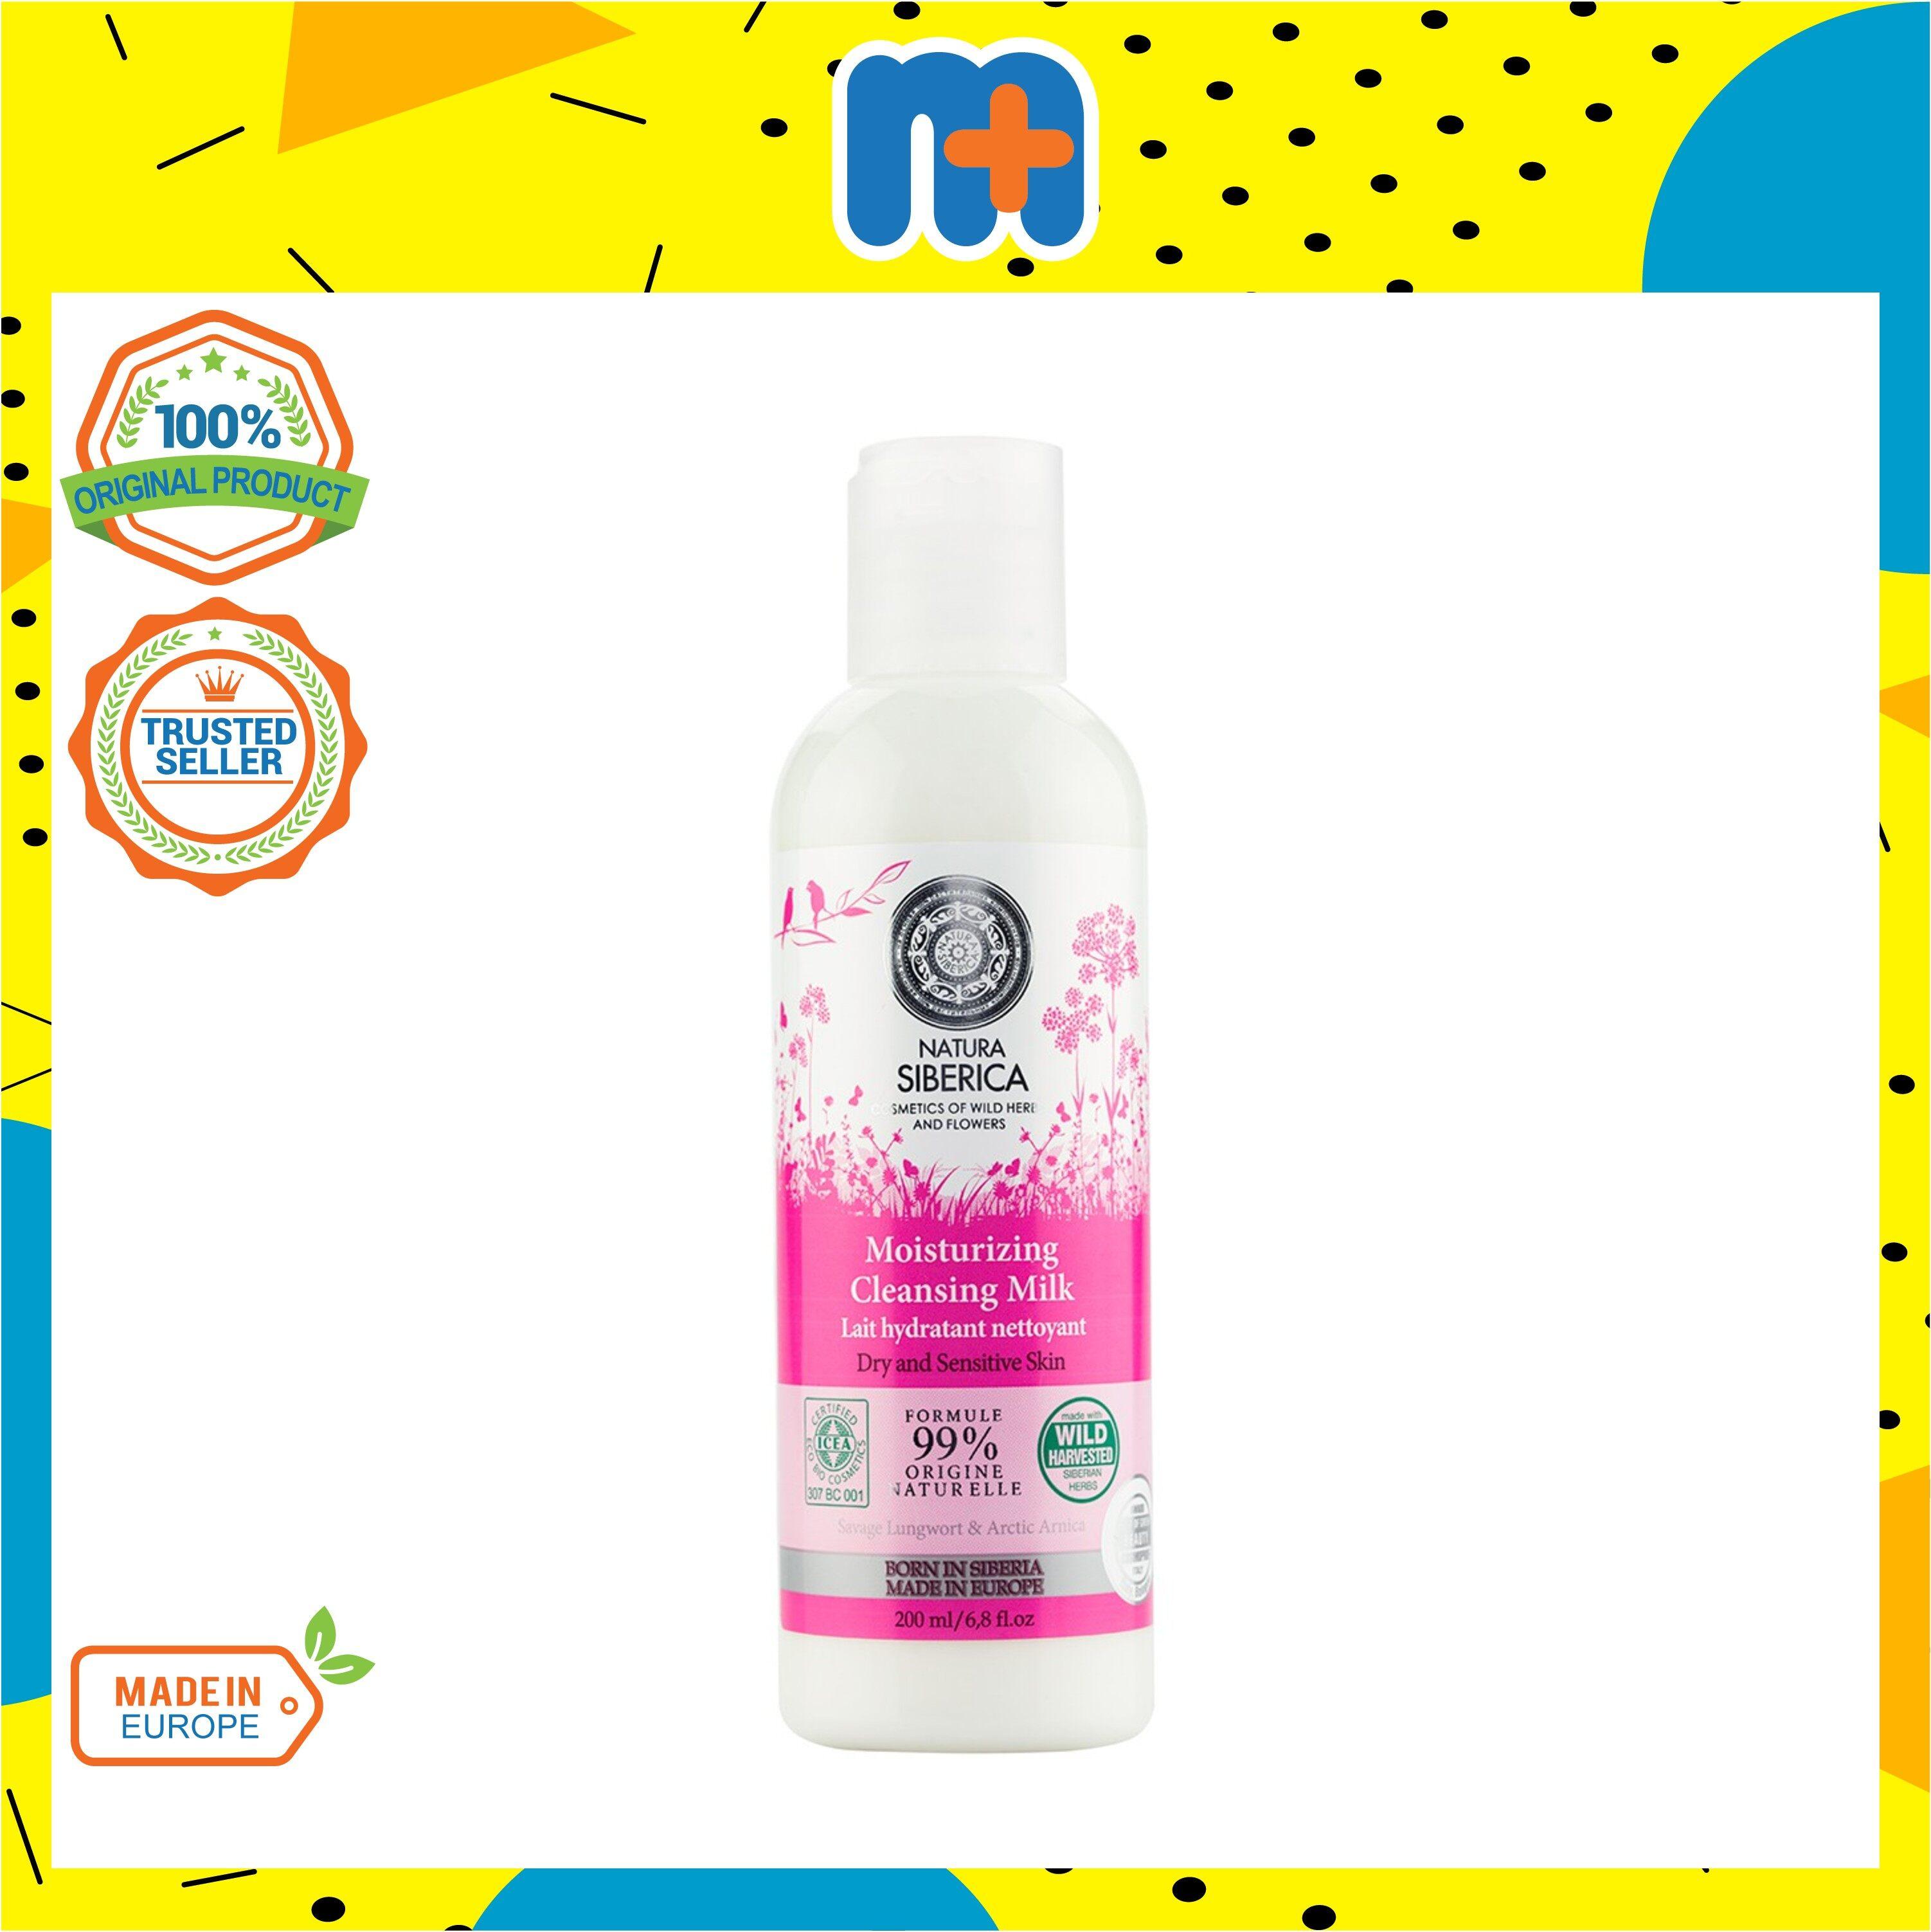 [MPLUS] NATURA SIBERICA Moisturizing Cleansing Milk 200ml